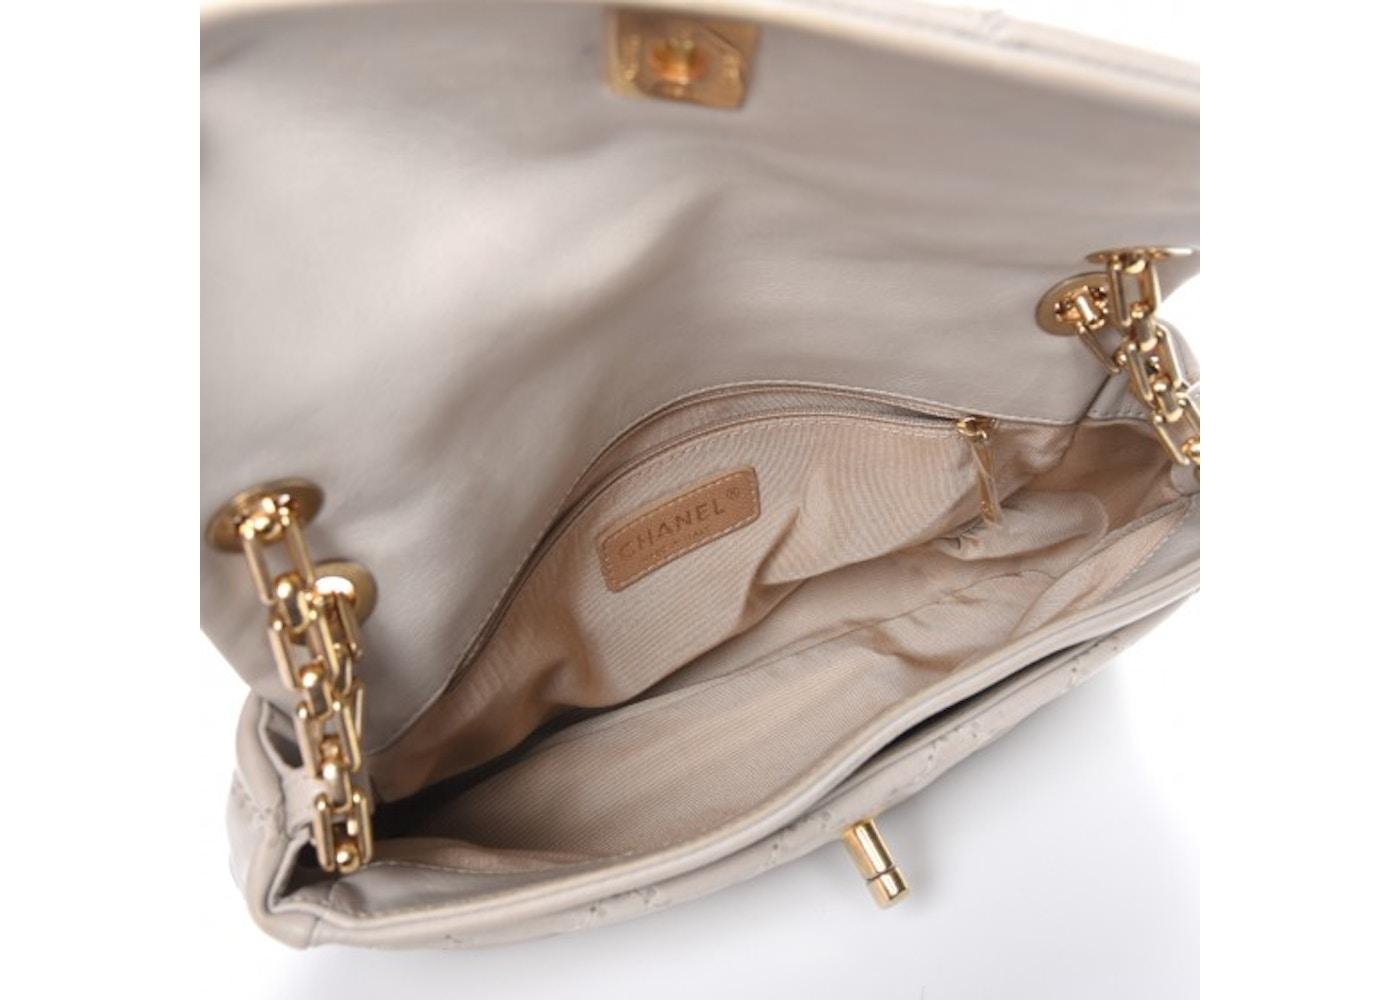 54a0e0492ba577 Chanel Retro Chain Flap Accordion Quilted Diamond Beige